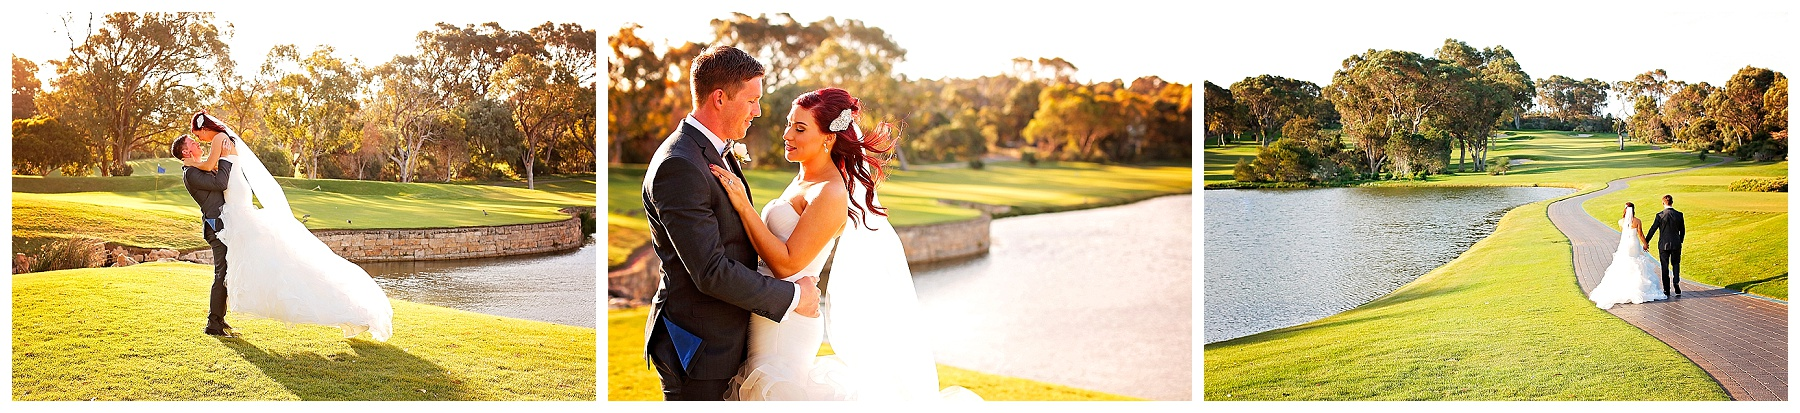 joondalup resort wedding photo locations